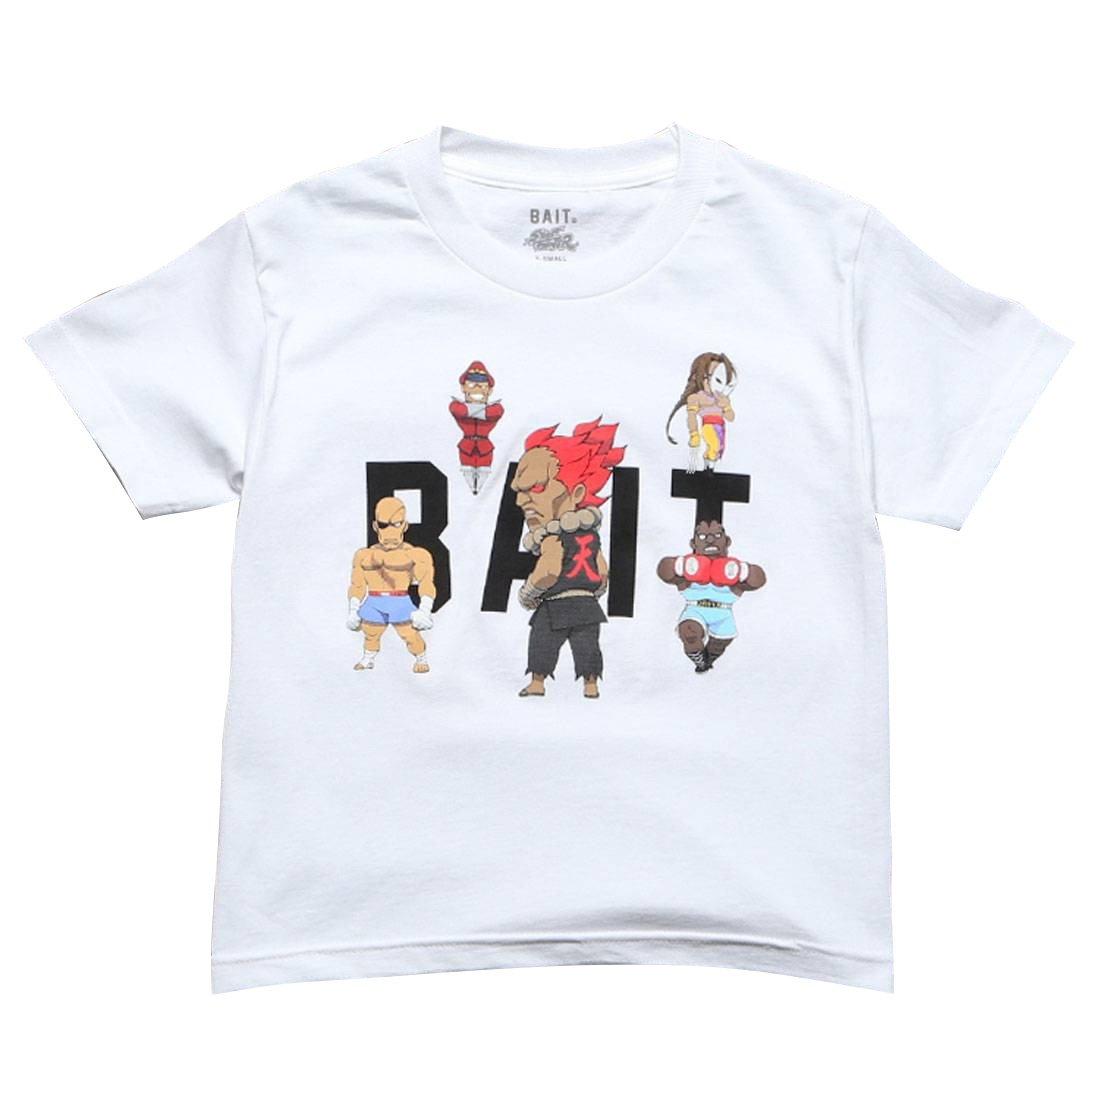 BAIT x Street Fighter Chibi Boss Youth Tee White